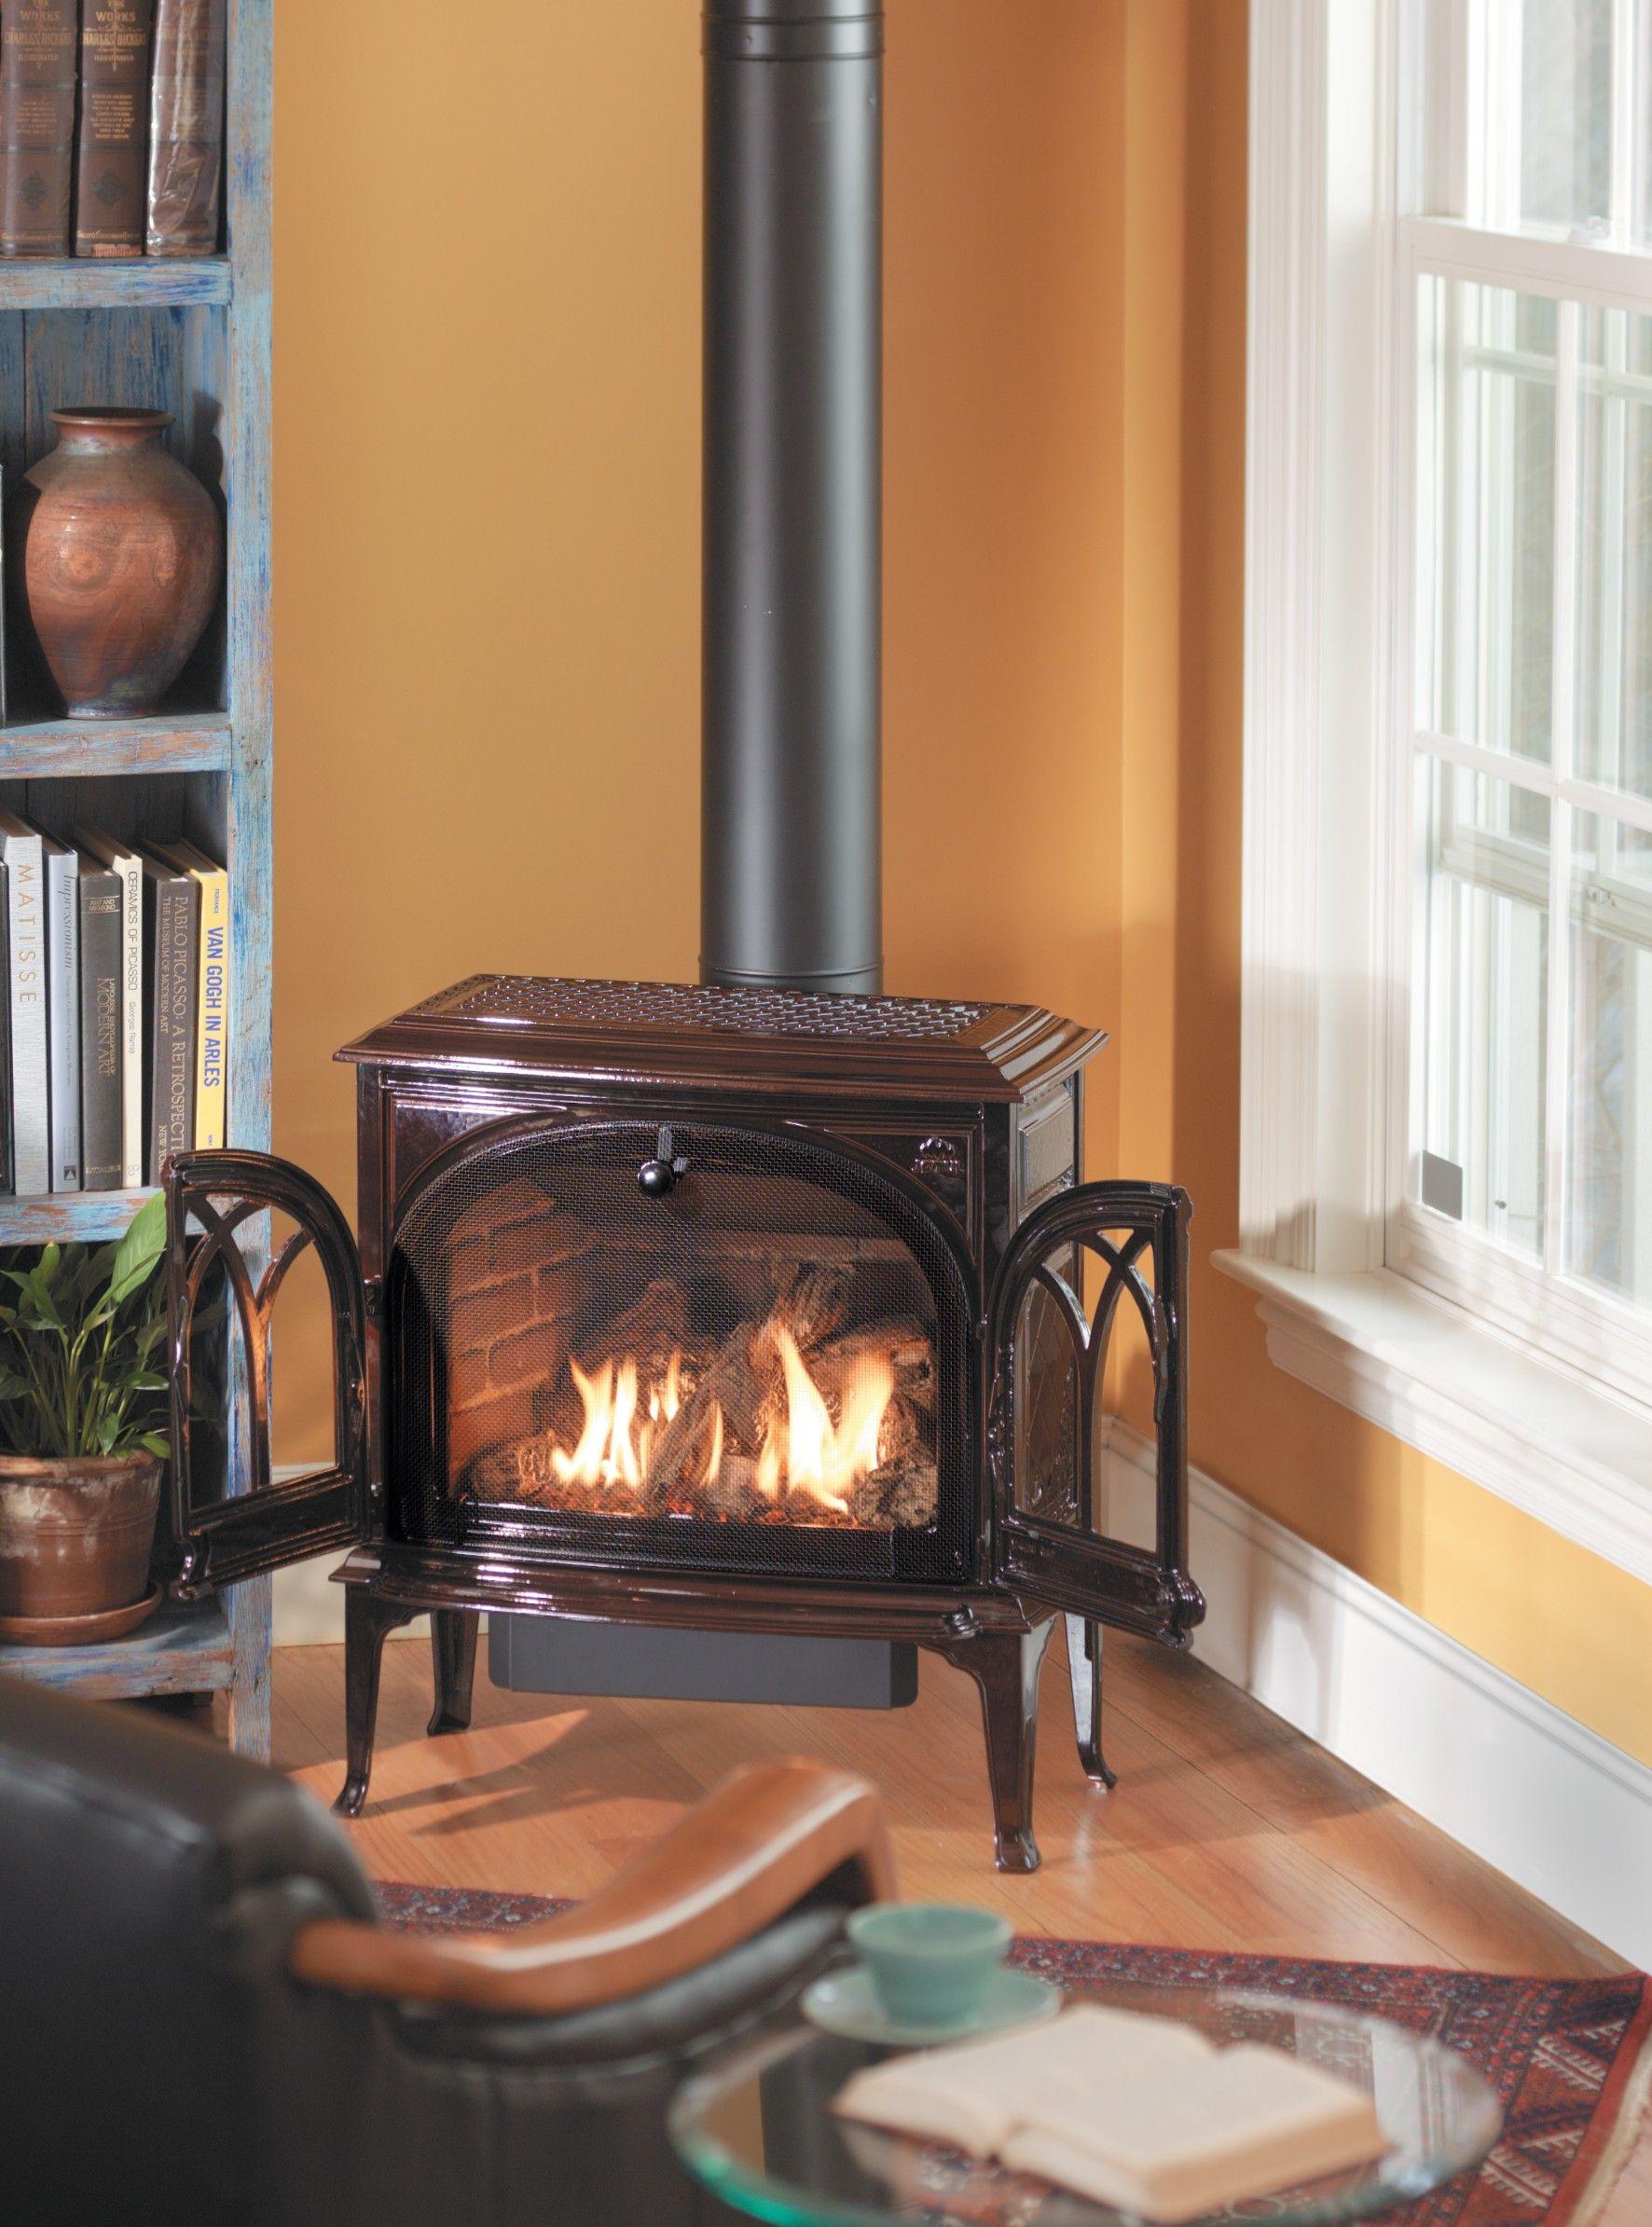 Jotul Gf 400 Dv Sebago Gas Stove Gas Stove Gas Fireplace Wood